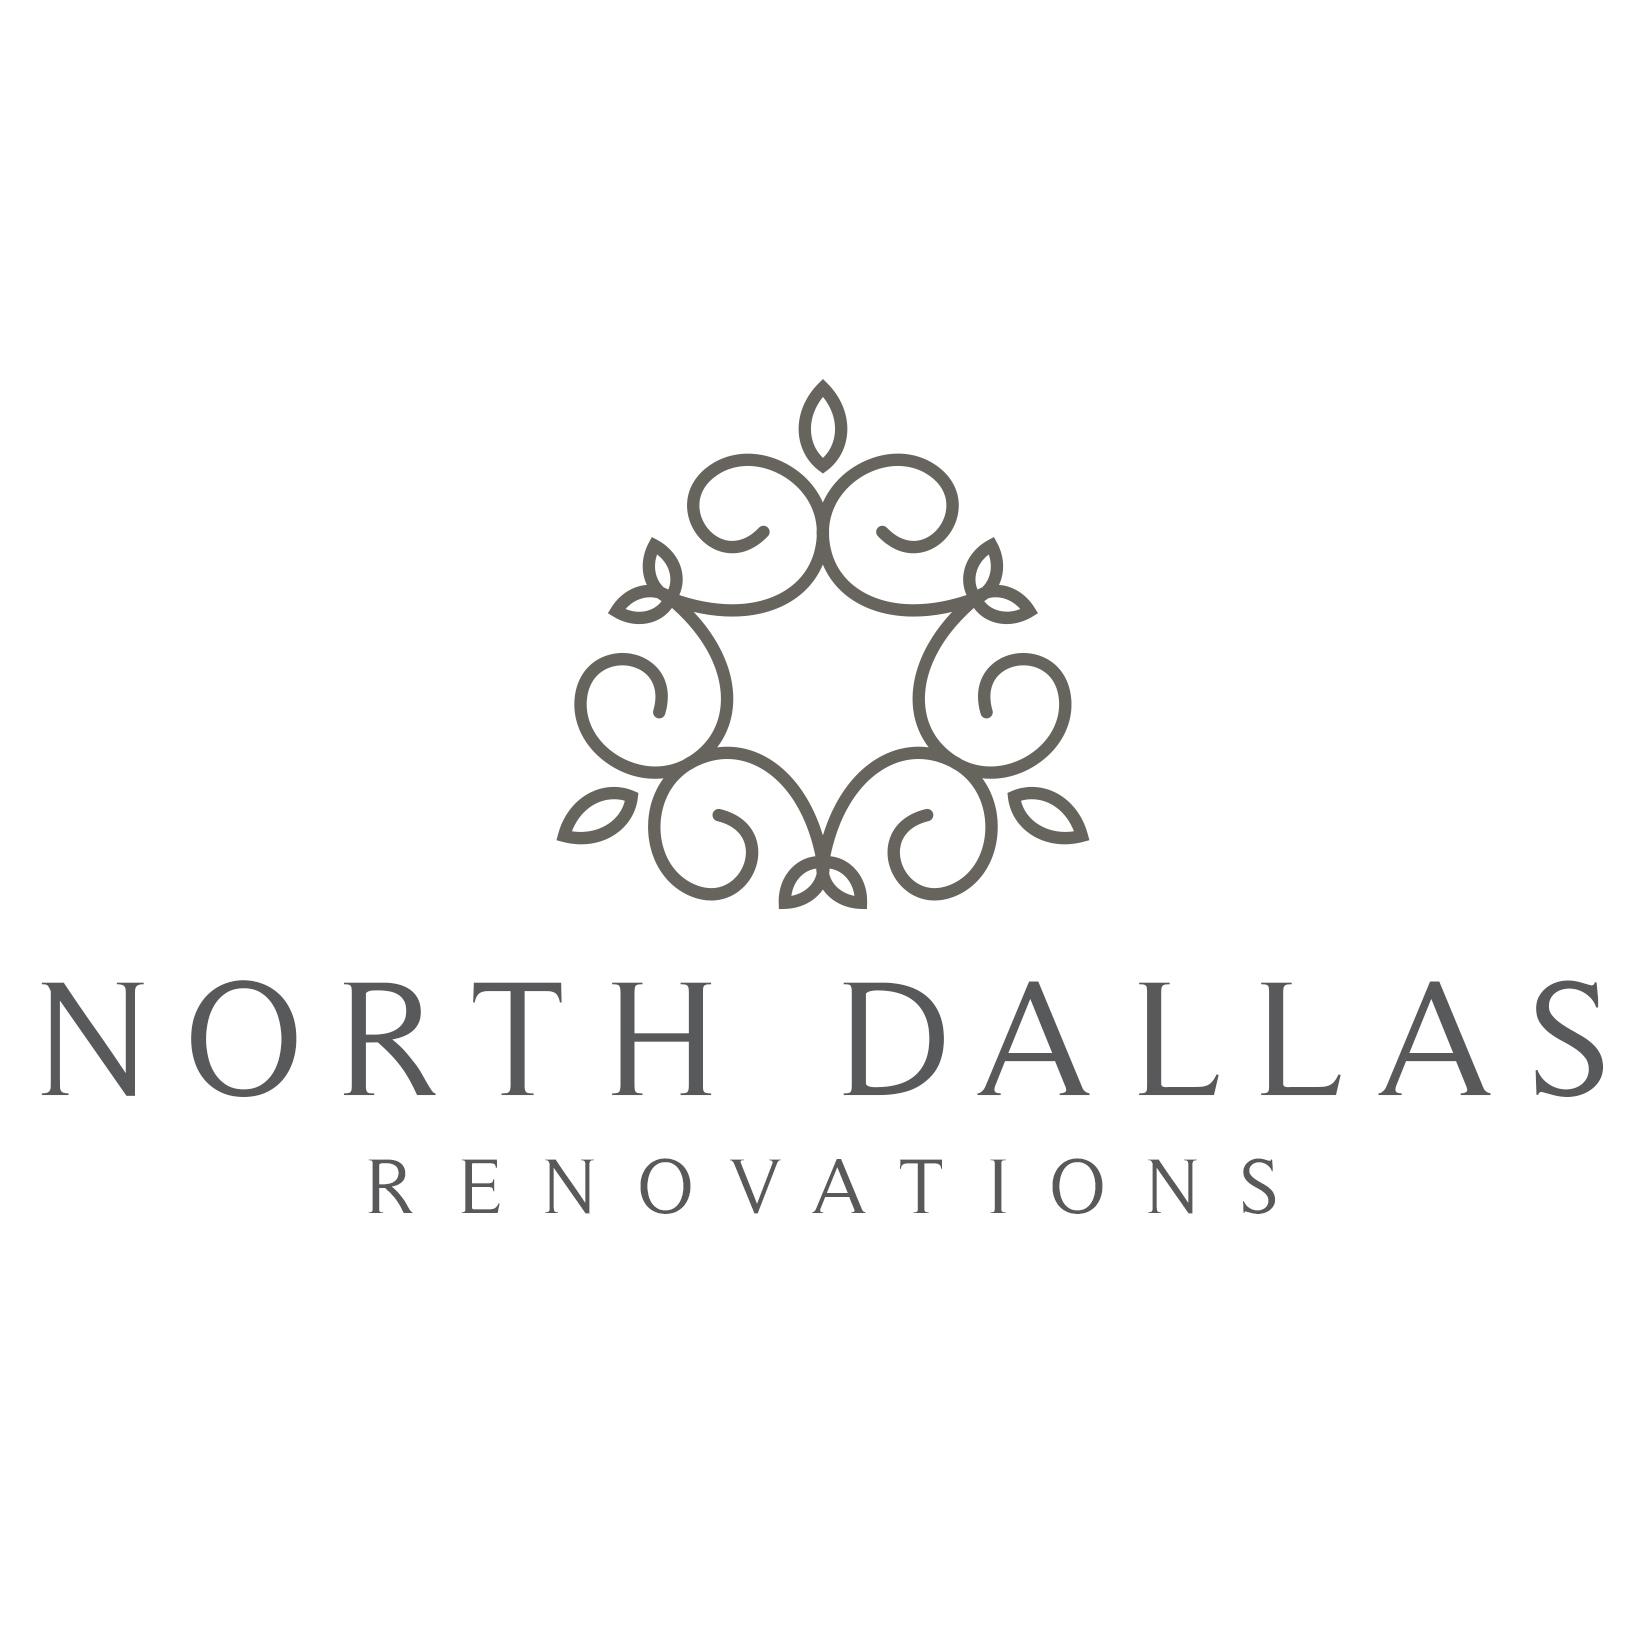 North Dallas Renovations logo